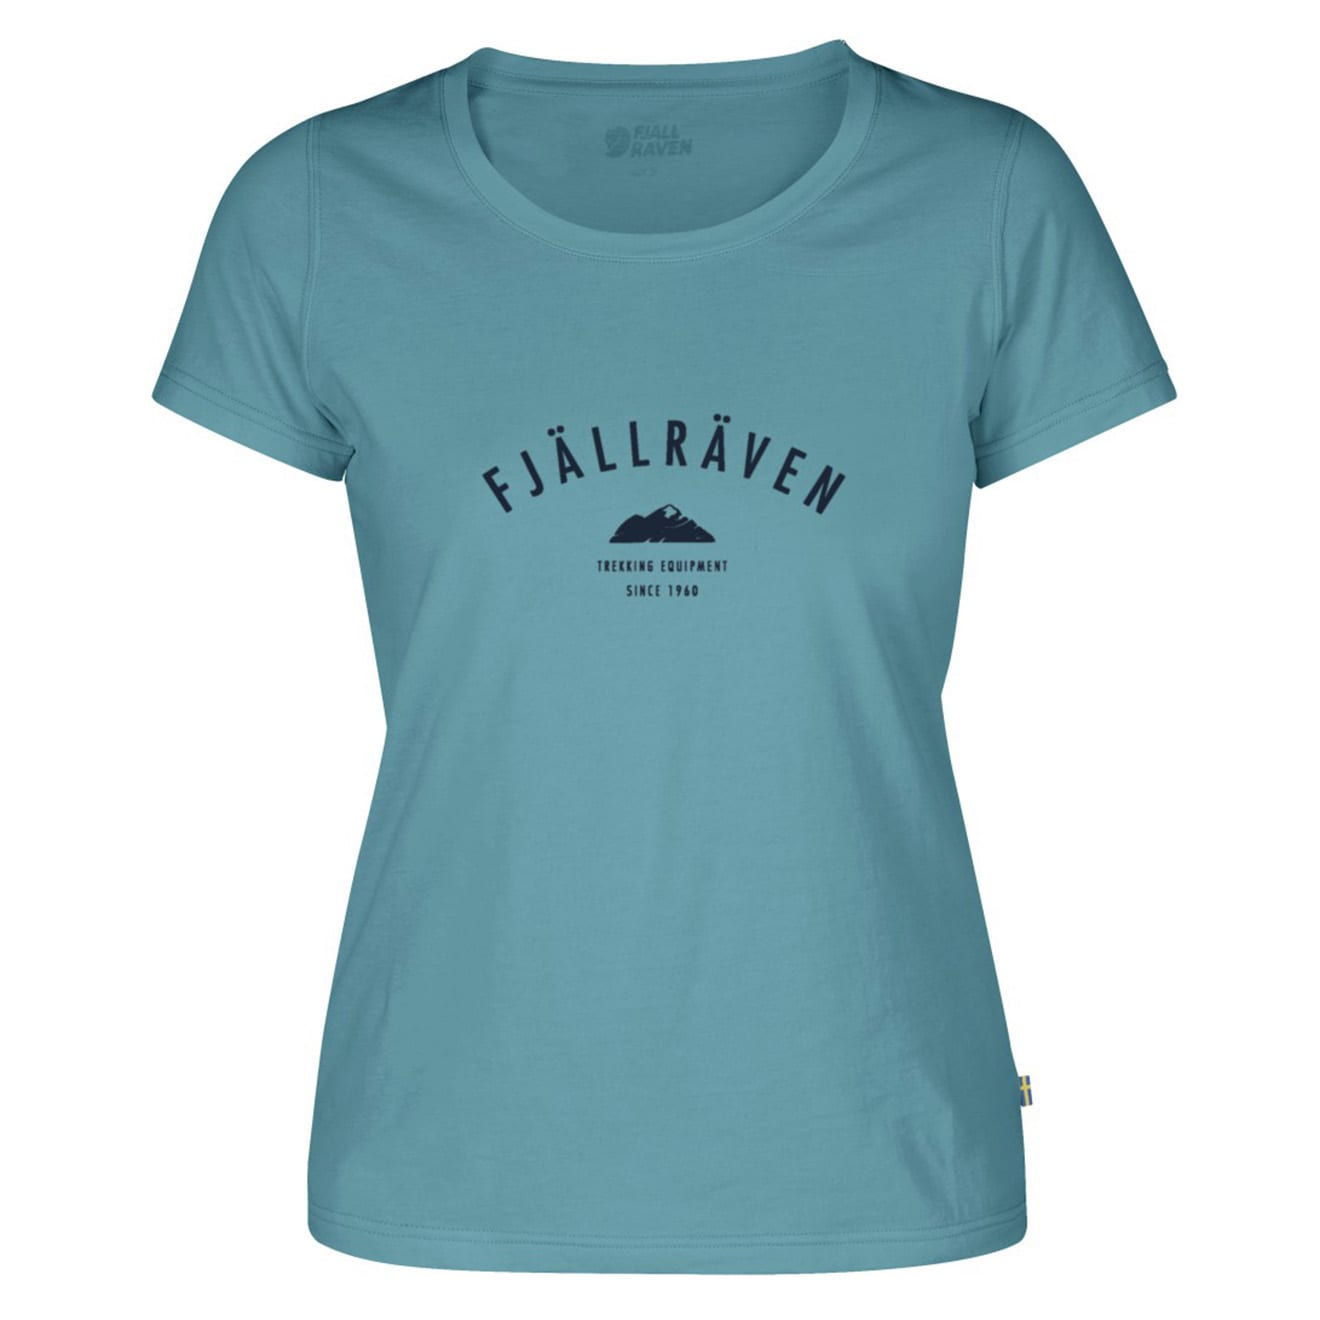 Fjallraven Womens Trekking Equipment T-Shirt Lagoon